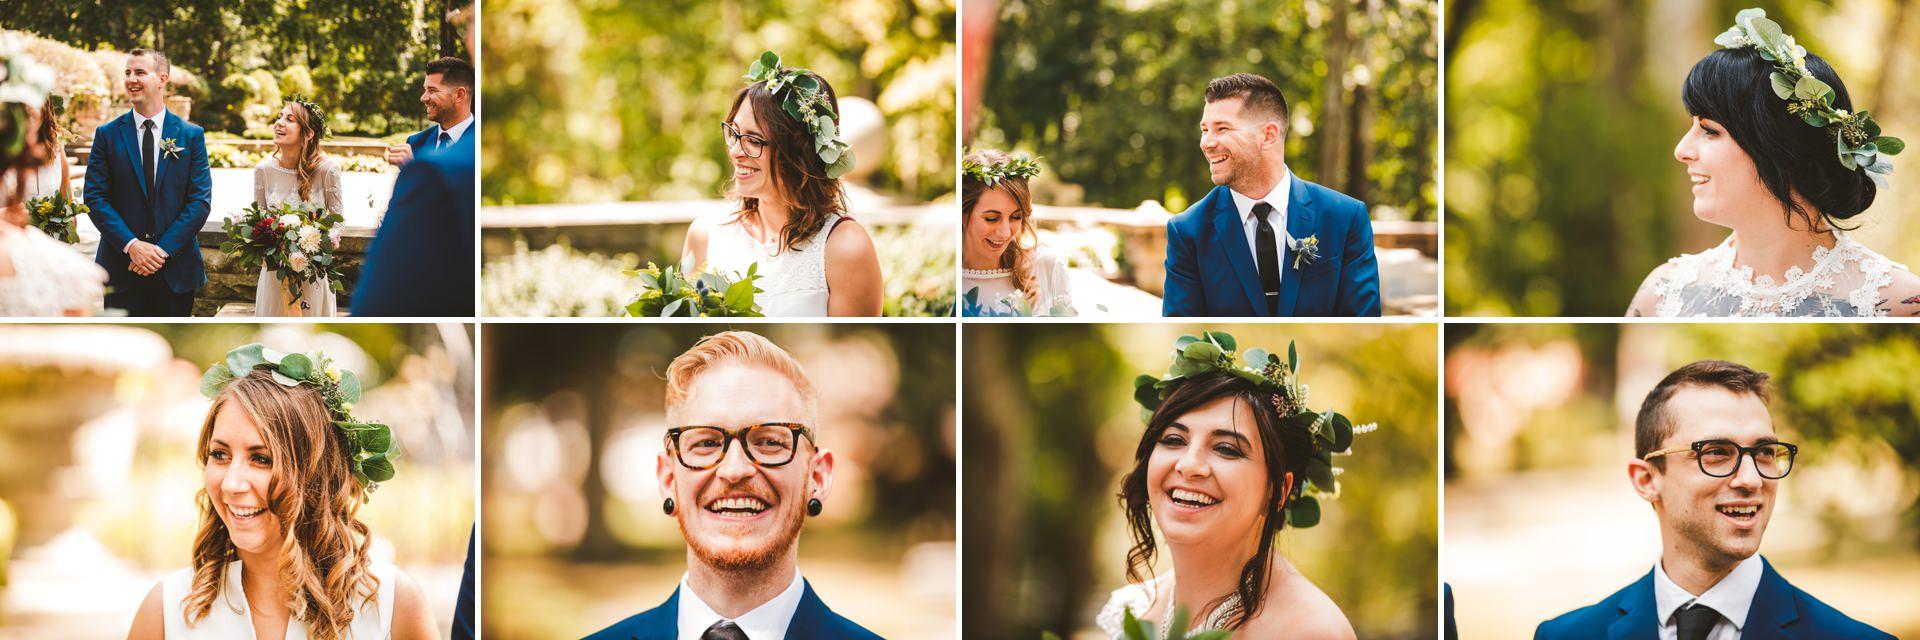 Ariel International Center Wedding Photographer in Cleveland 22.jpg